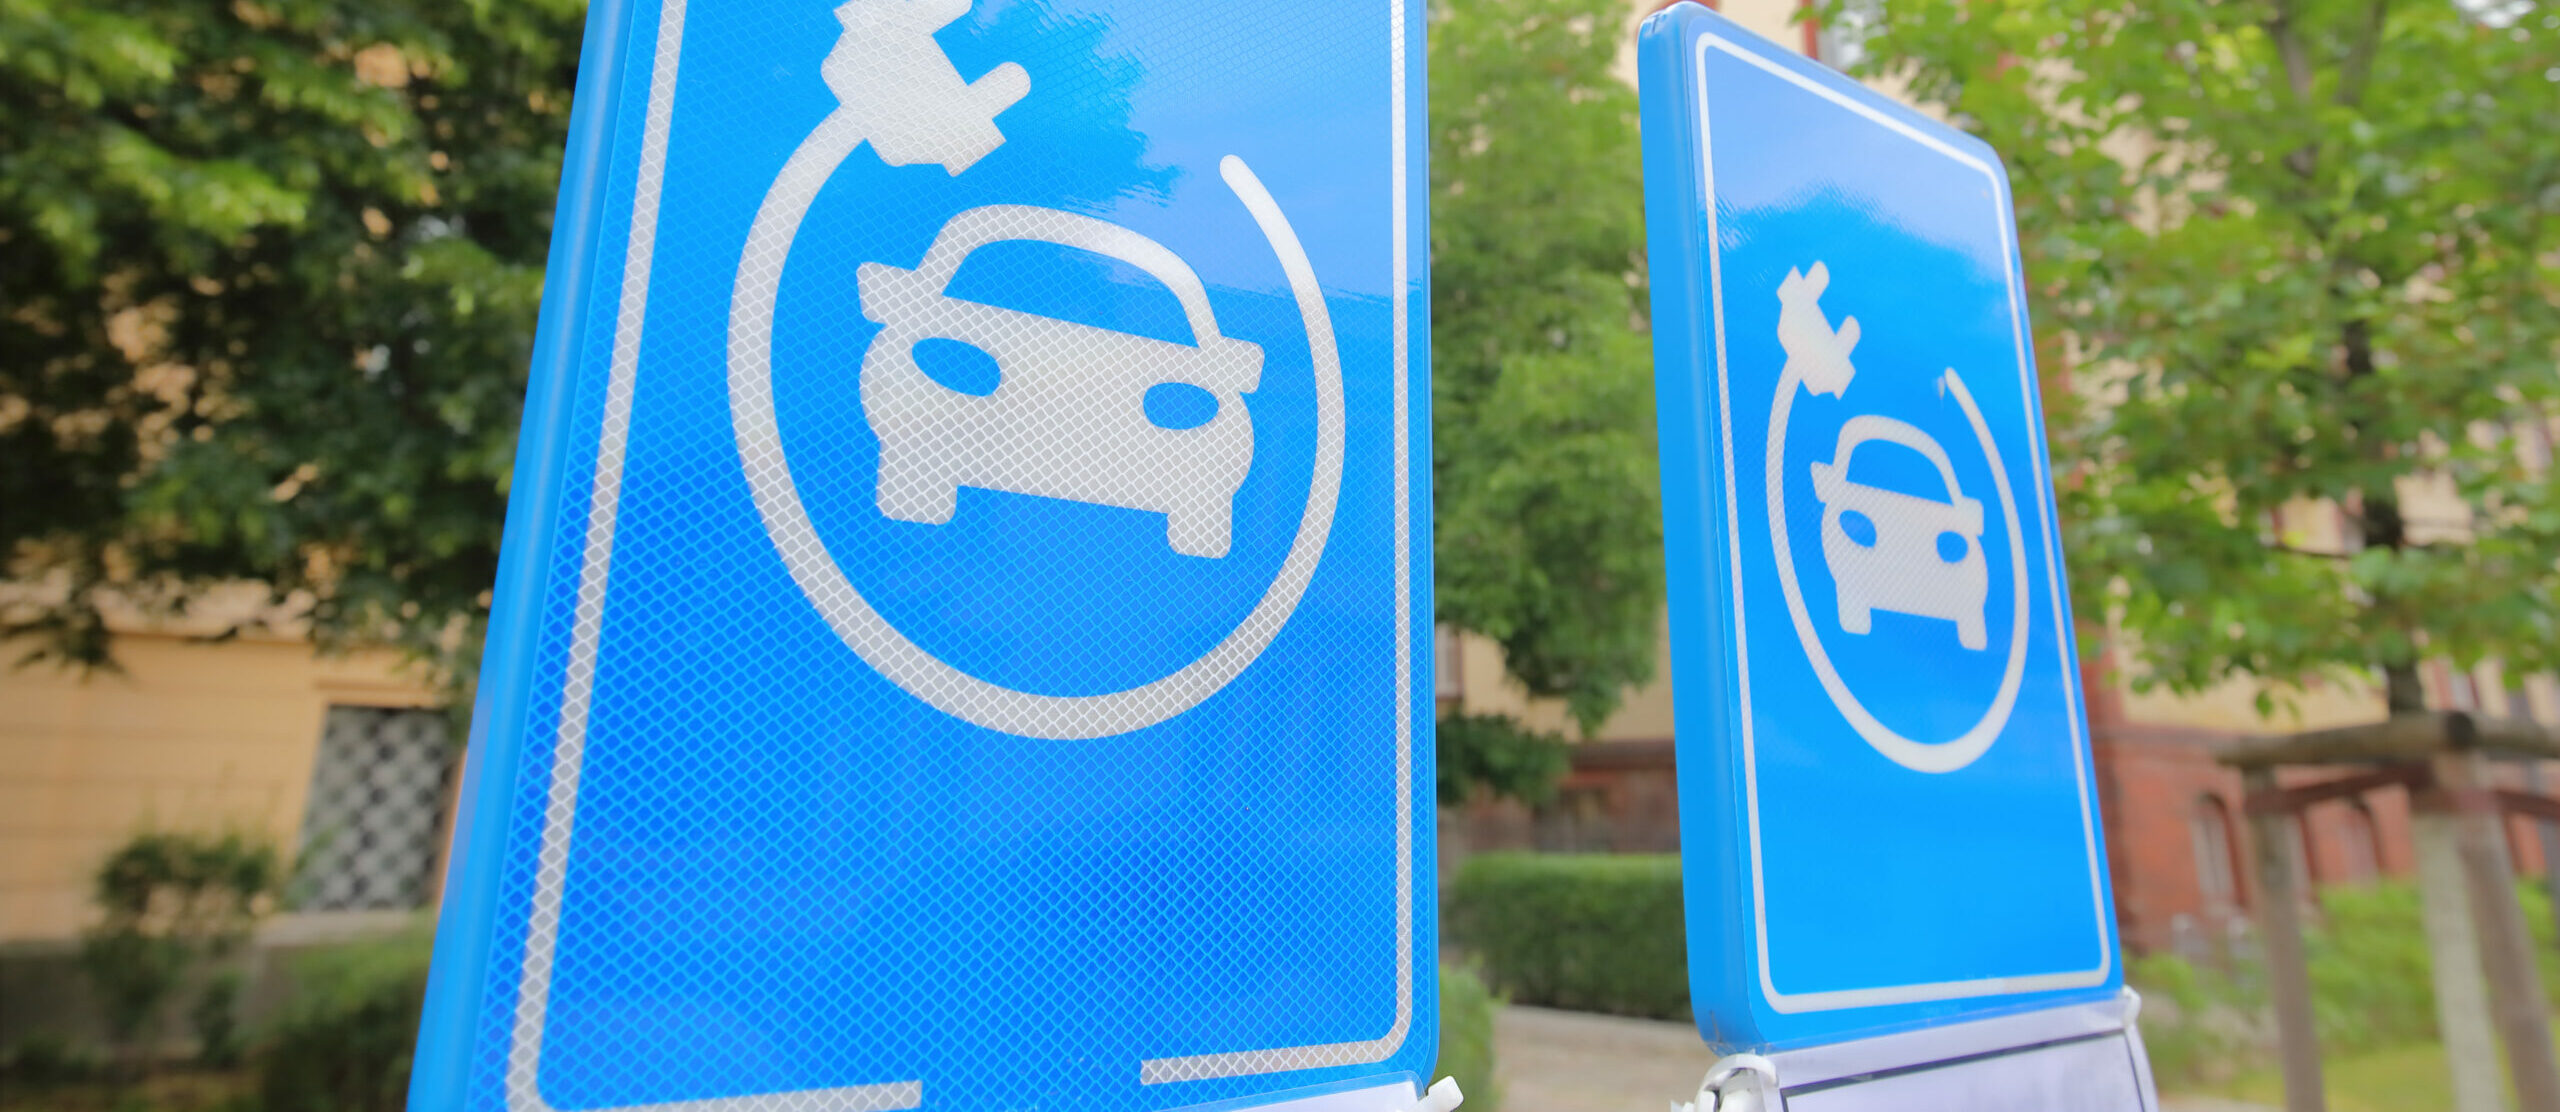 EV Charging Signposting for EV installations charging units